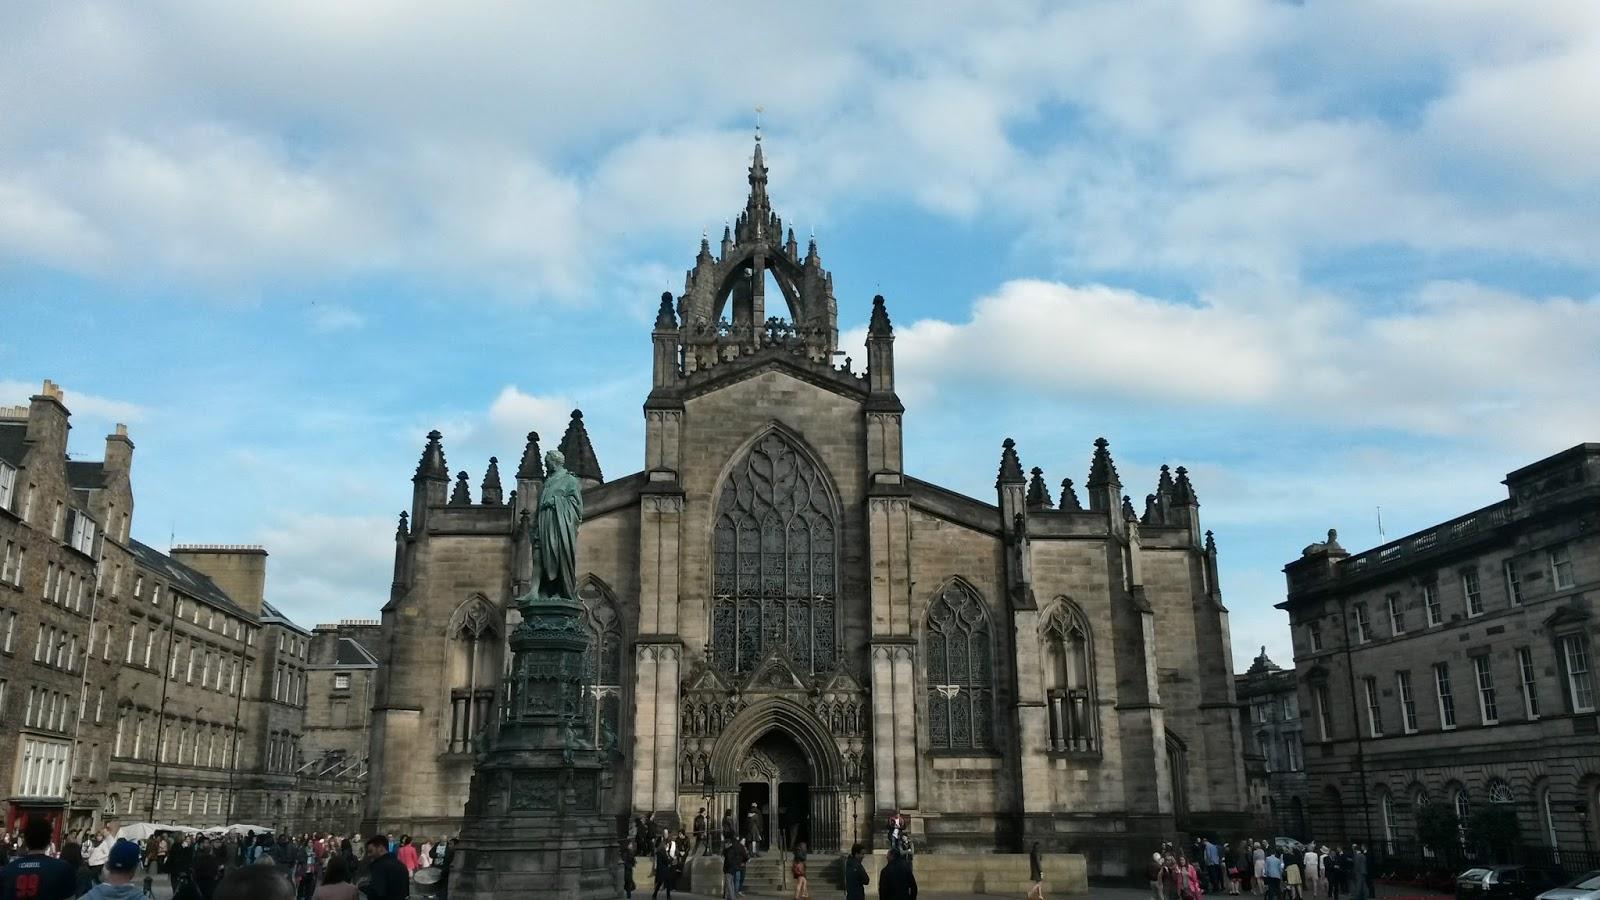 edinburgh scotland iskoçyaroyal mile st giles cathedral katedrali britanya